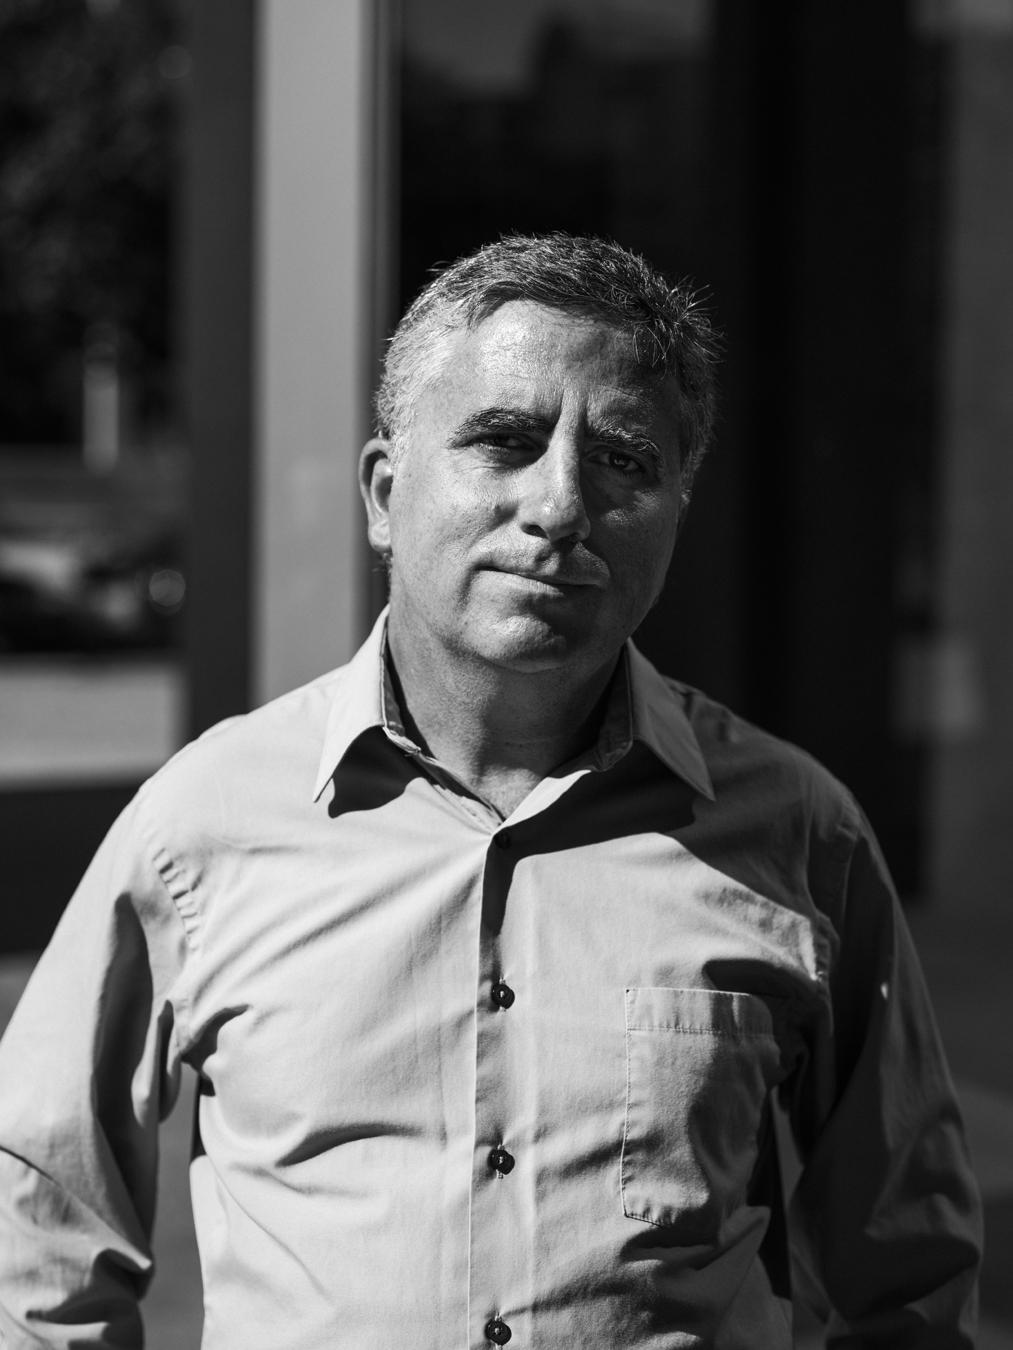 John Mckiernan-Gonzalez